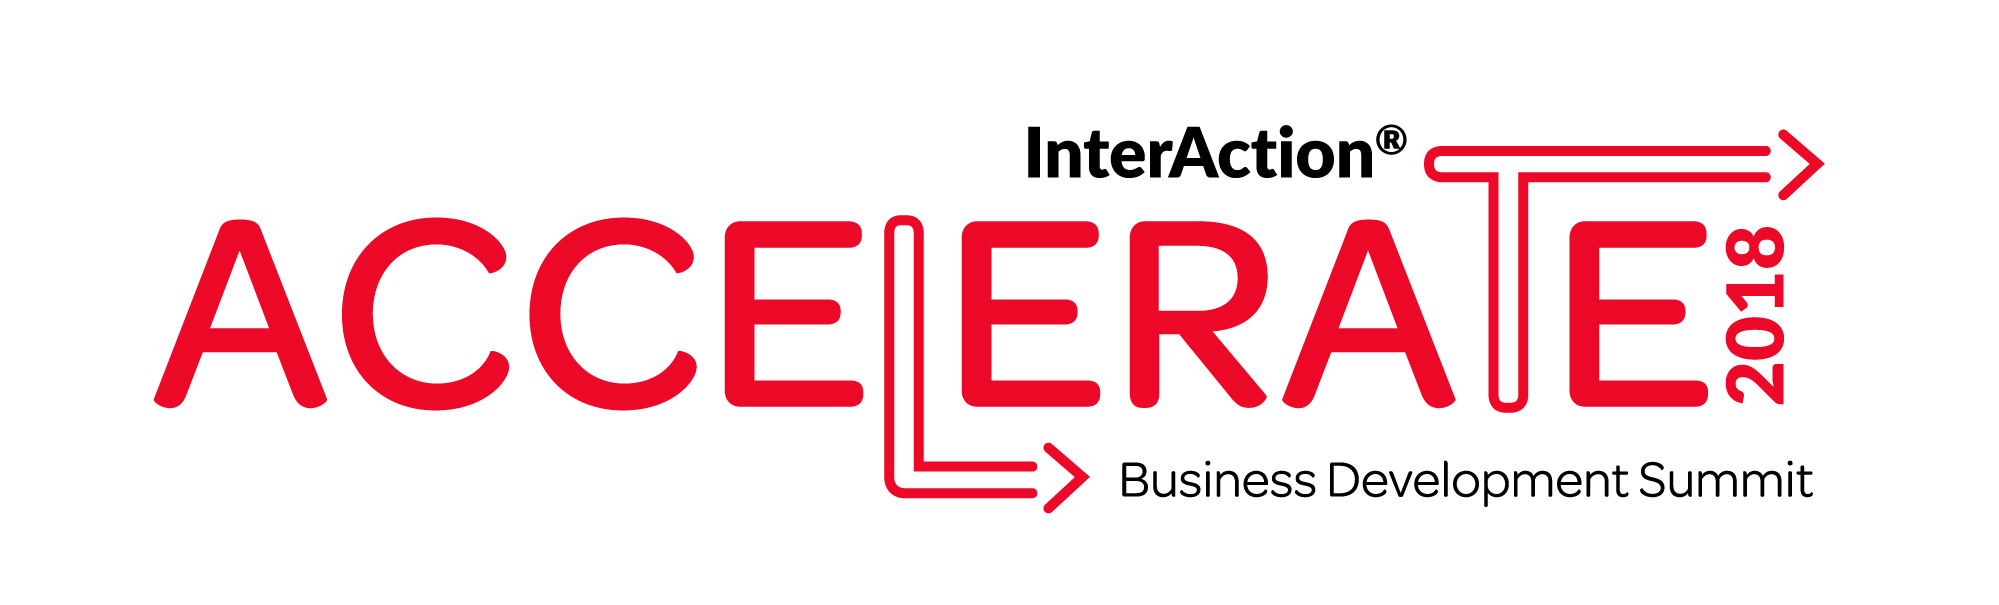 Accelerate Business Development Summit: 2018 Registration